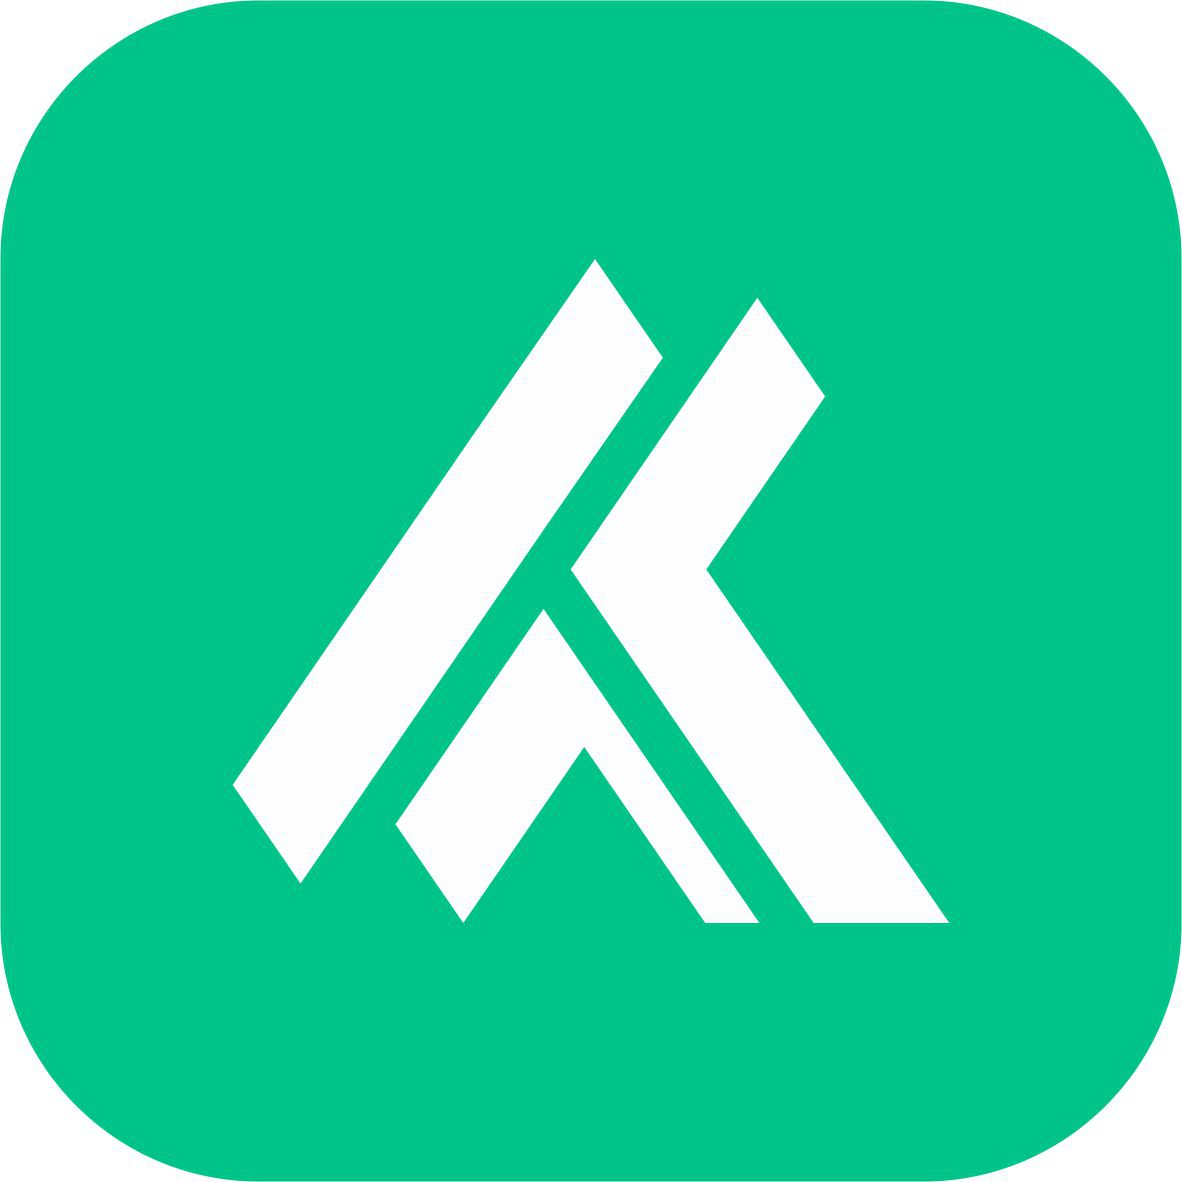 Modern, Virtual, High Tech Financial Firm